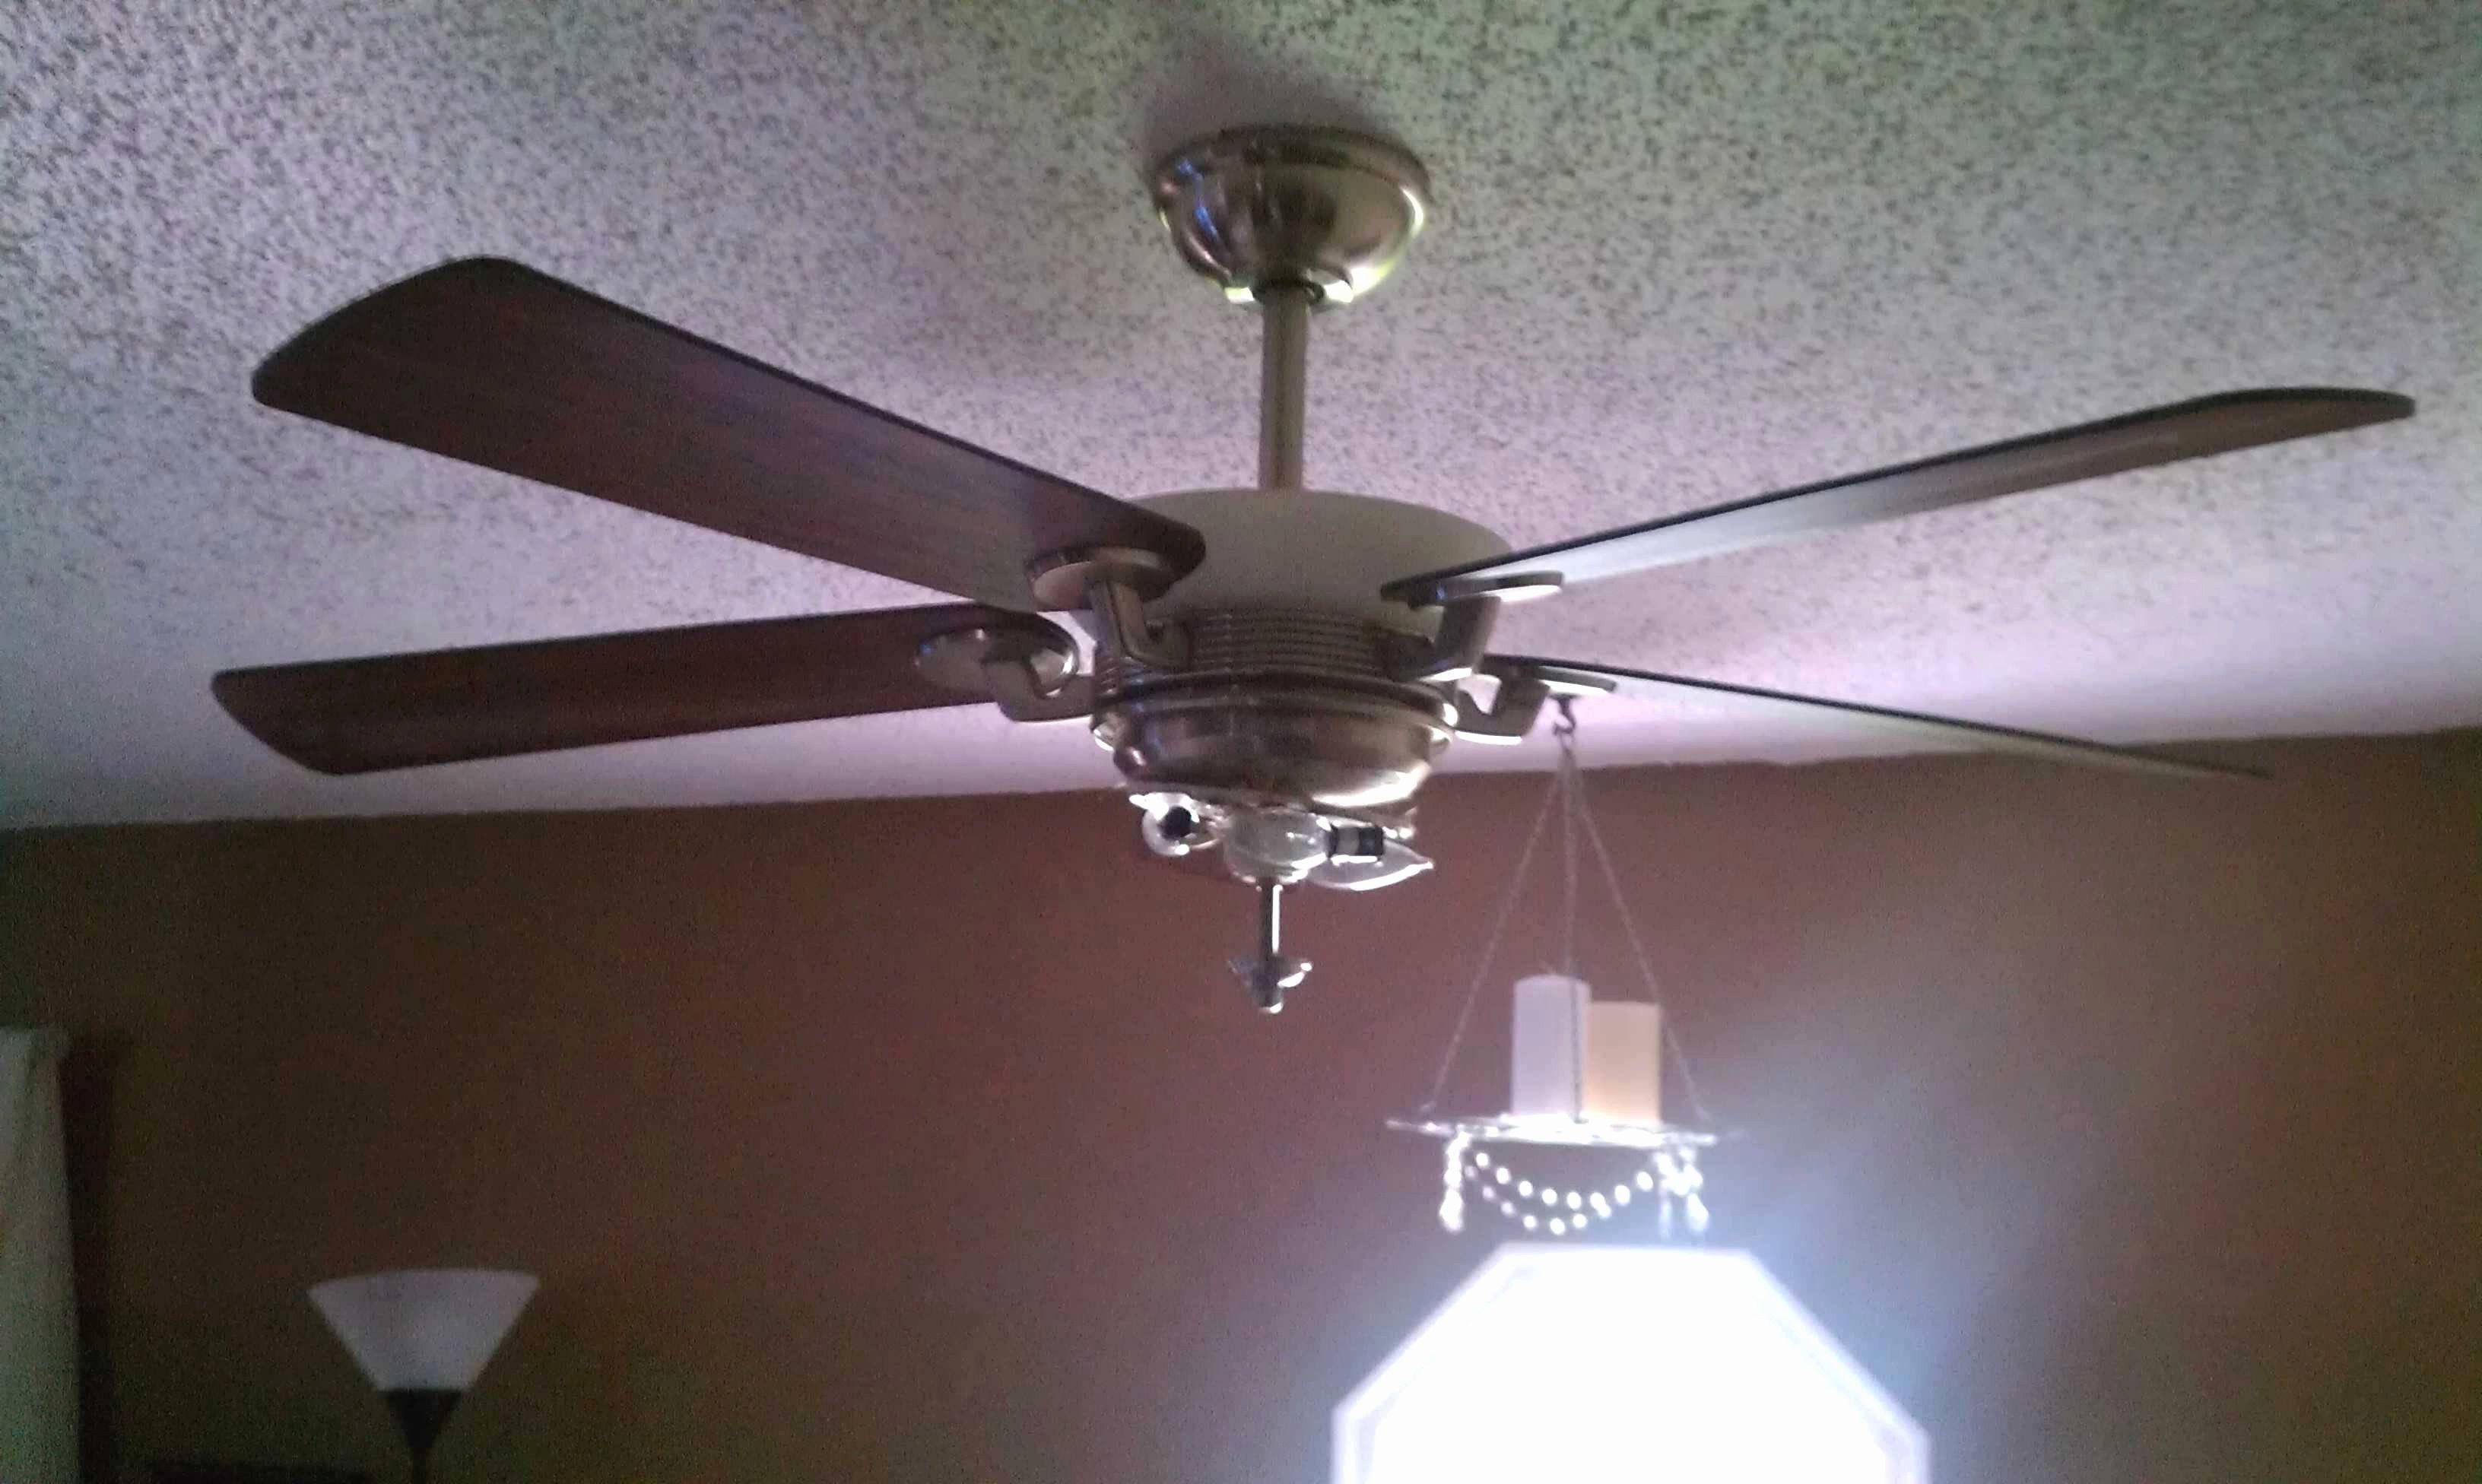 Modern Ceiling Fans With Lights Foothillfolk Designs